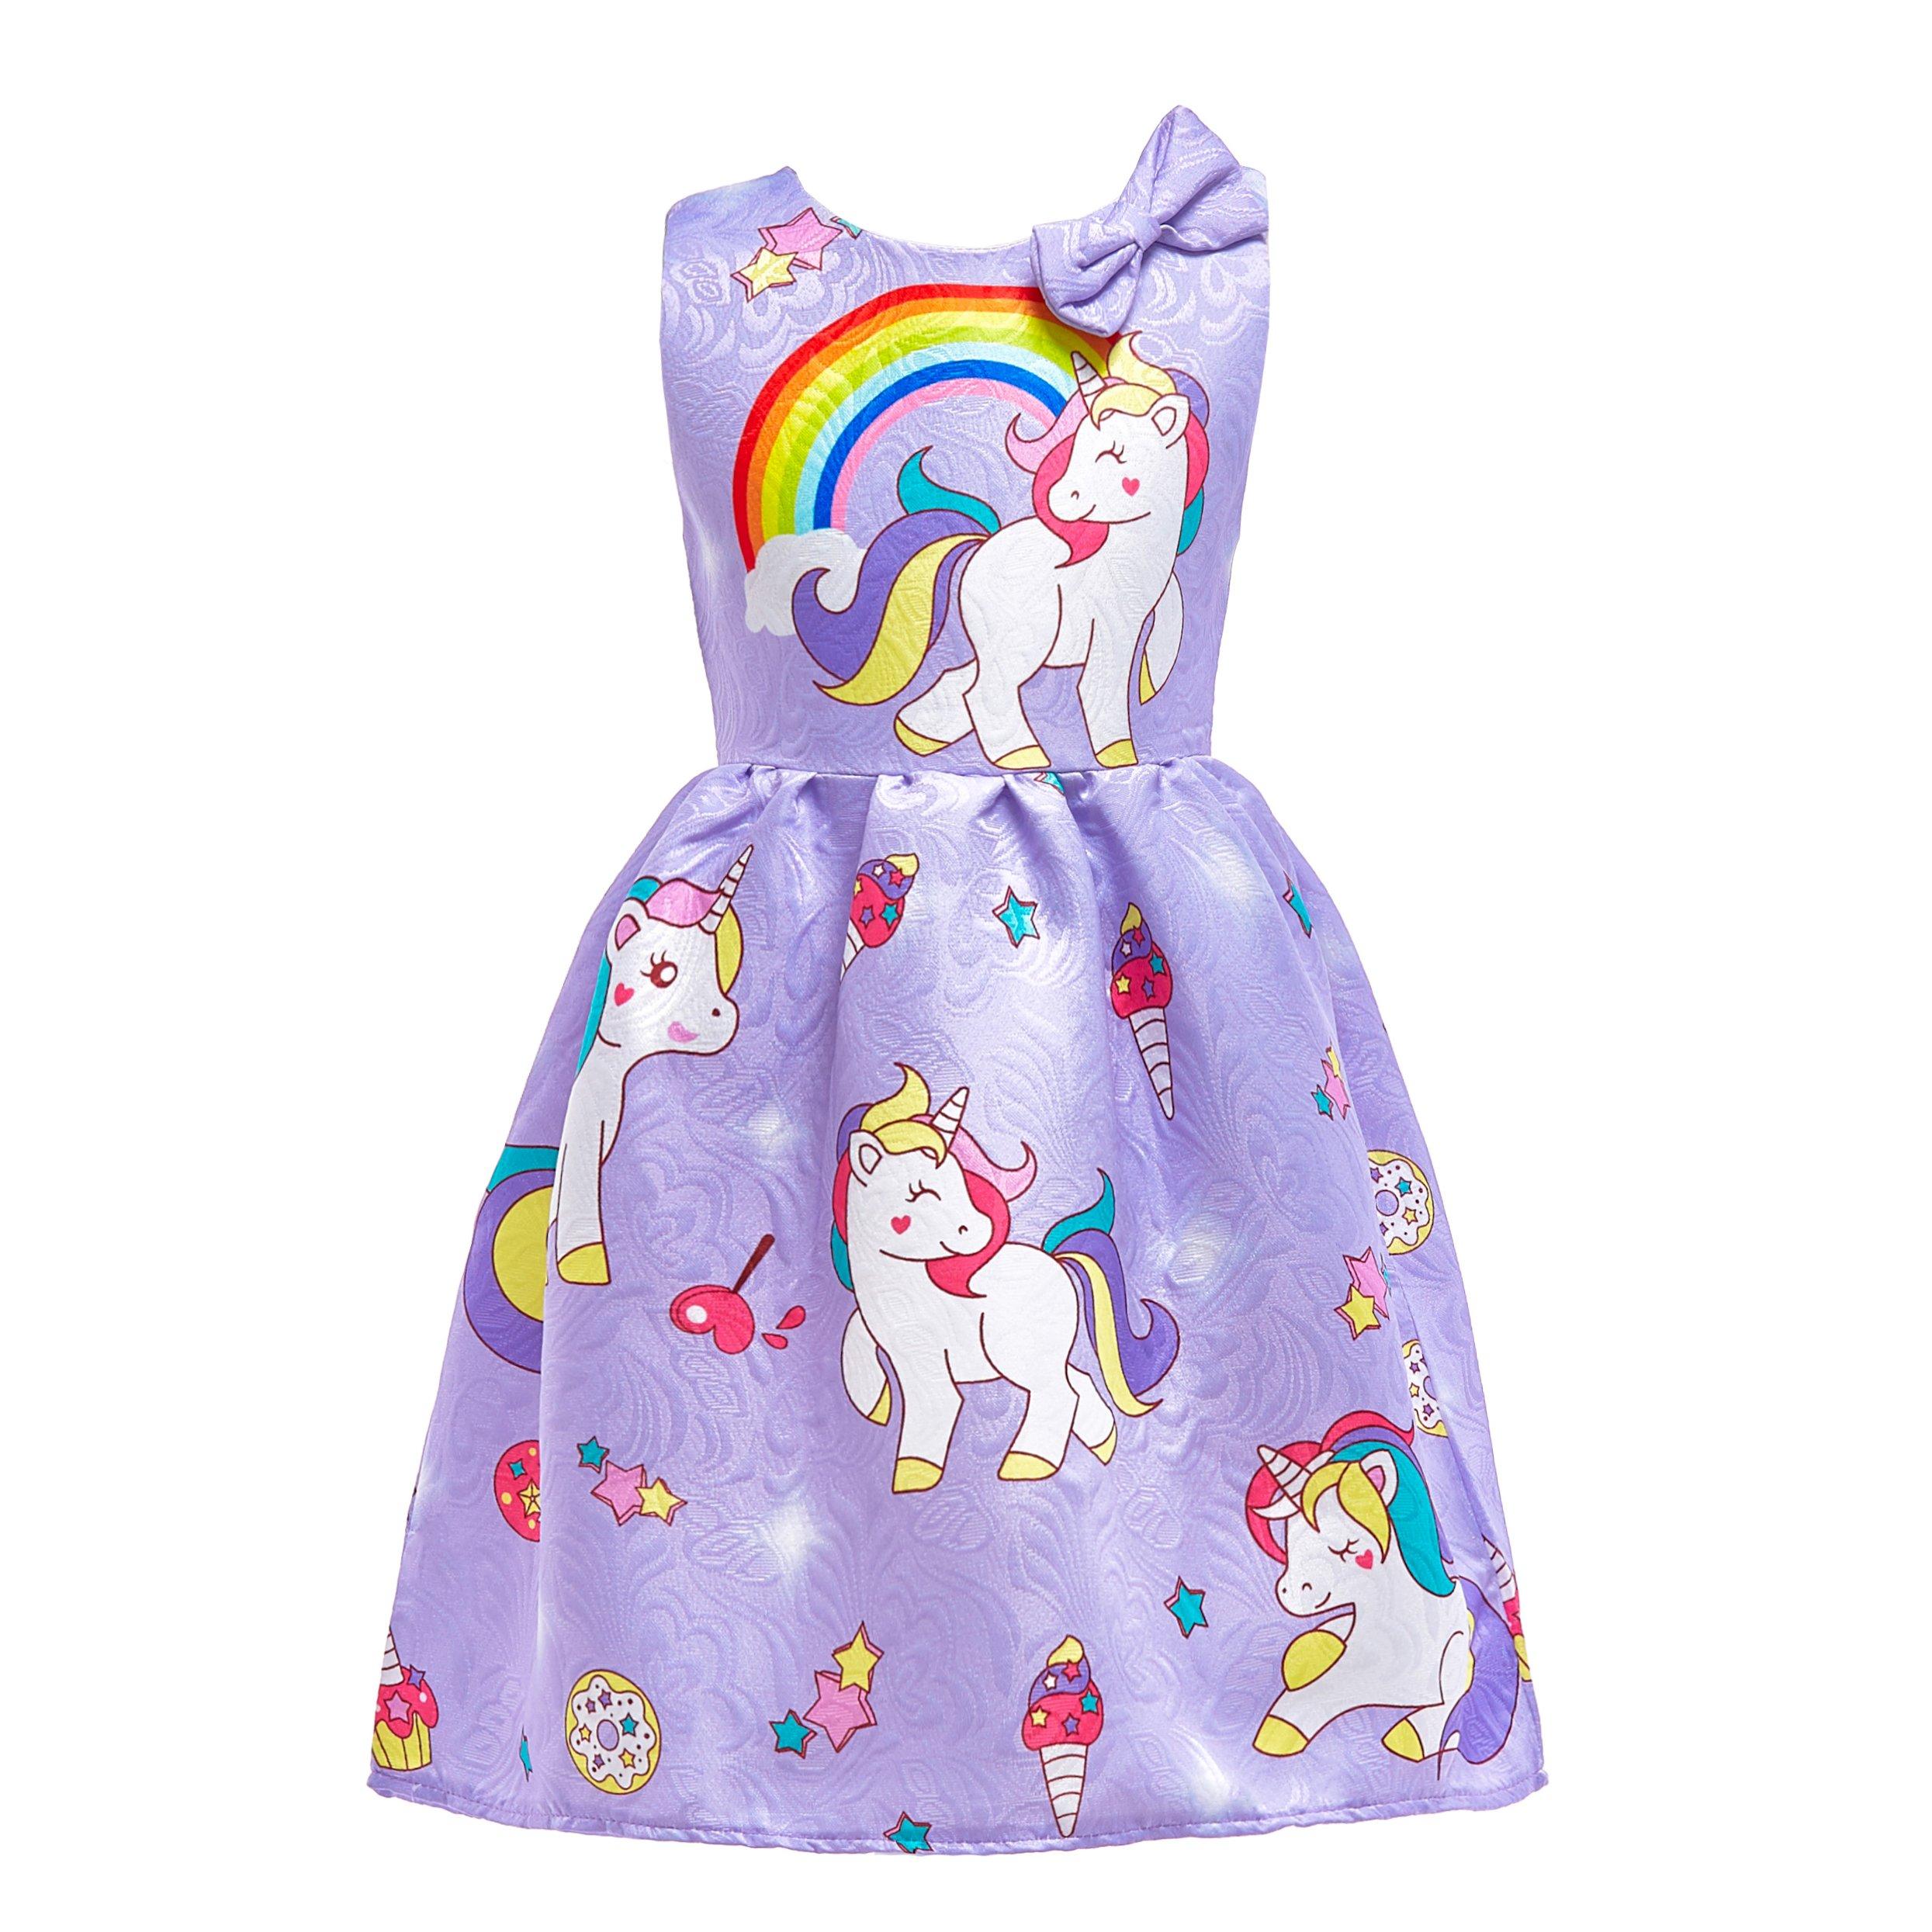 Dressy Daisy Girls My Little Pony Dress Costumes Unicorn Costumes Fancy Dress up Size 6X Purple FC128